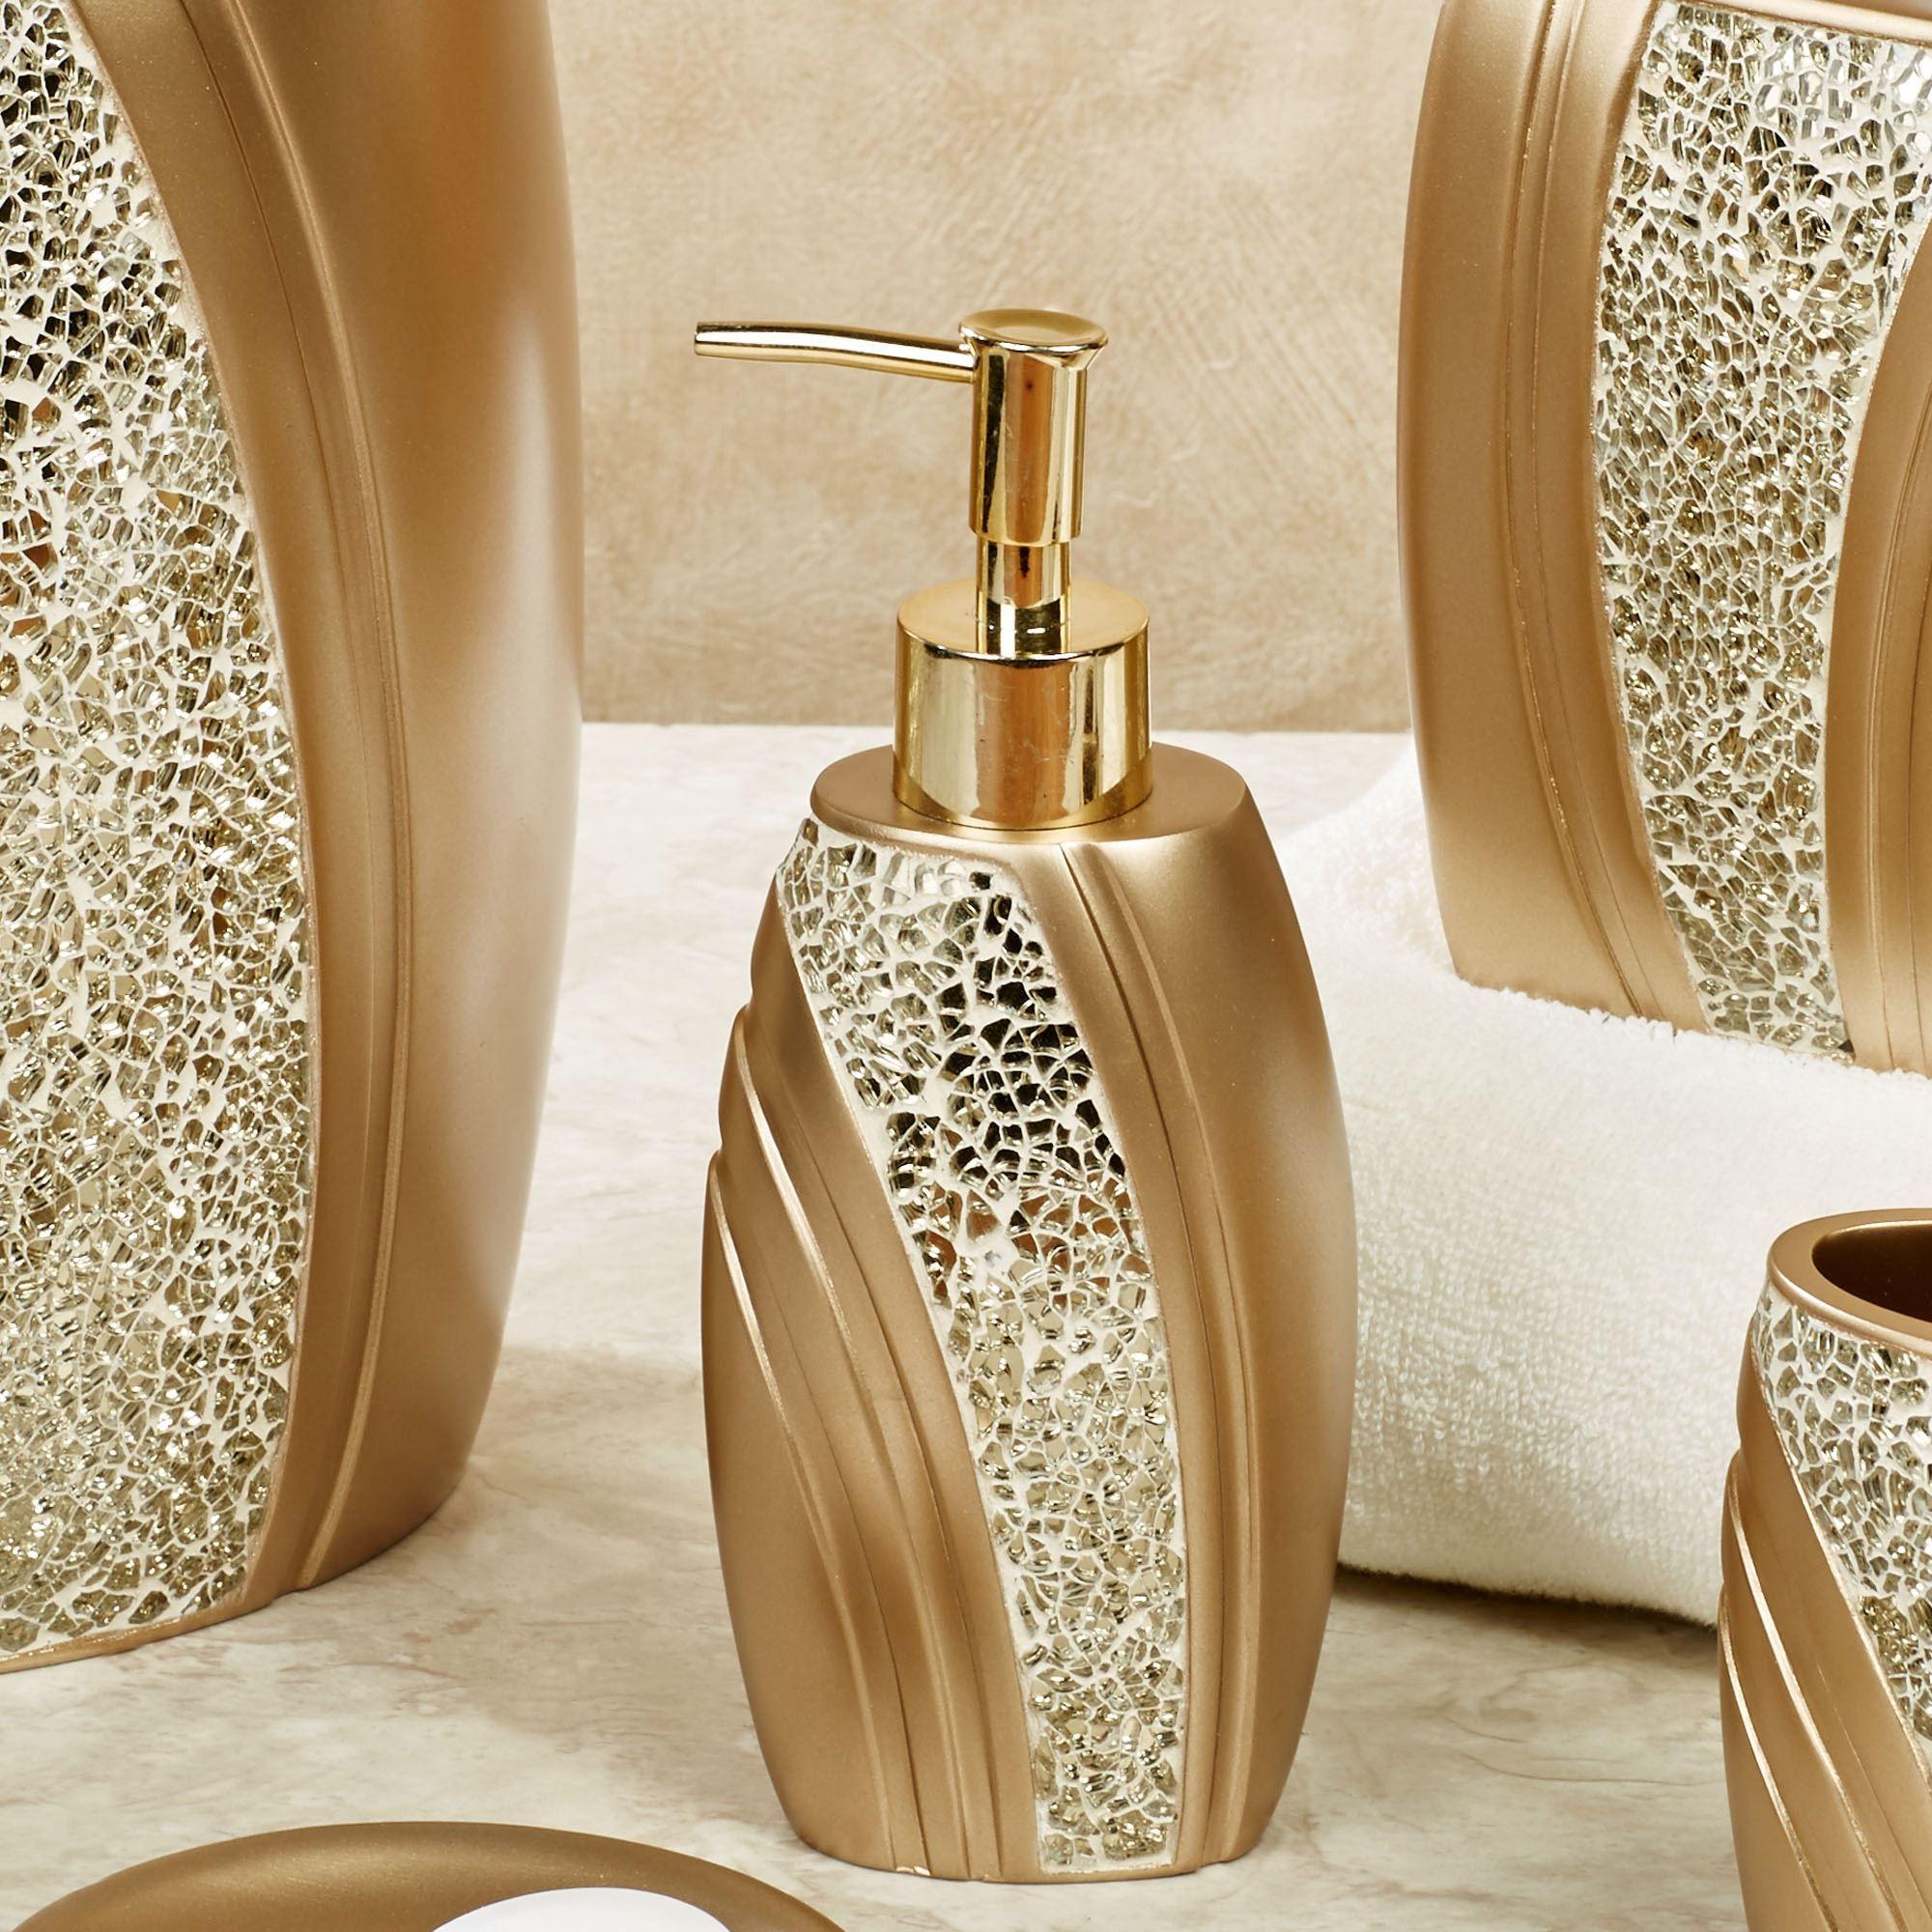 Glamour Mosaic Champagne Gold Bath Accessories